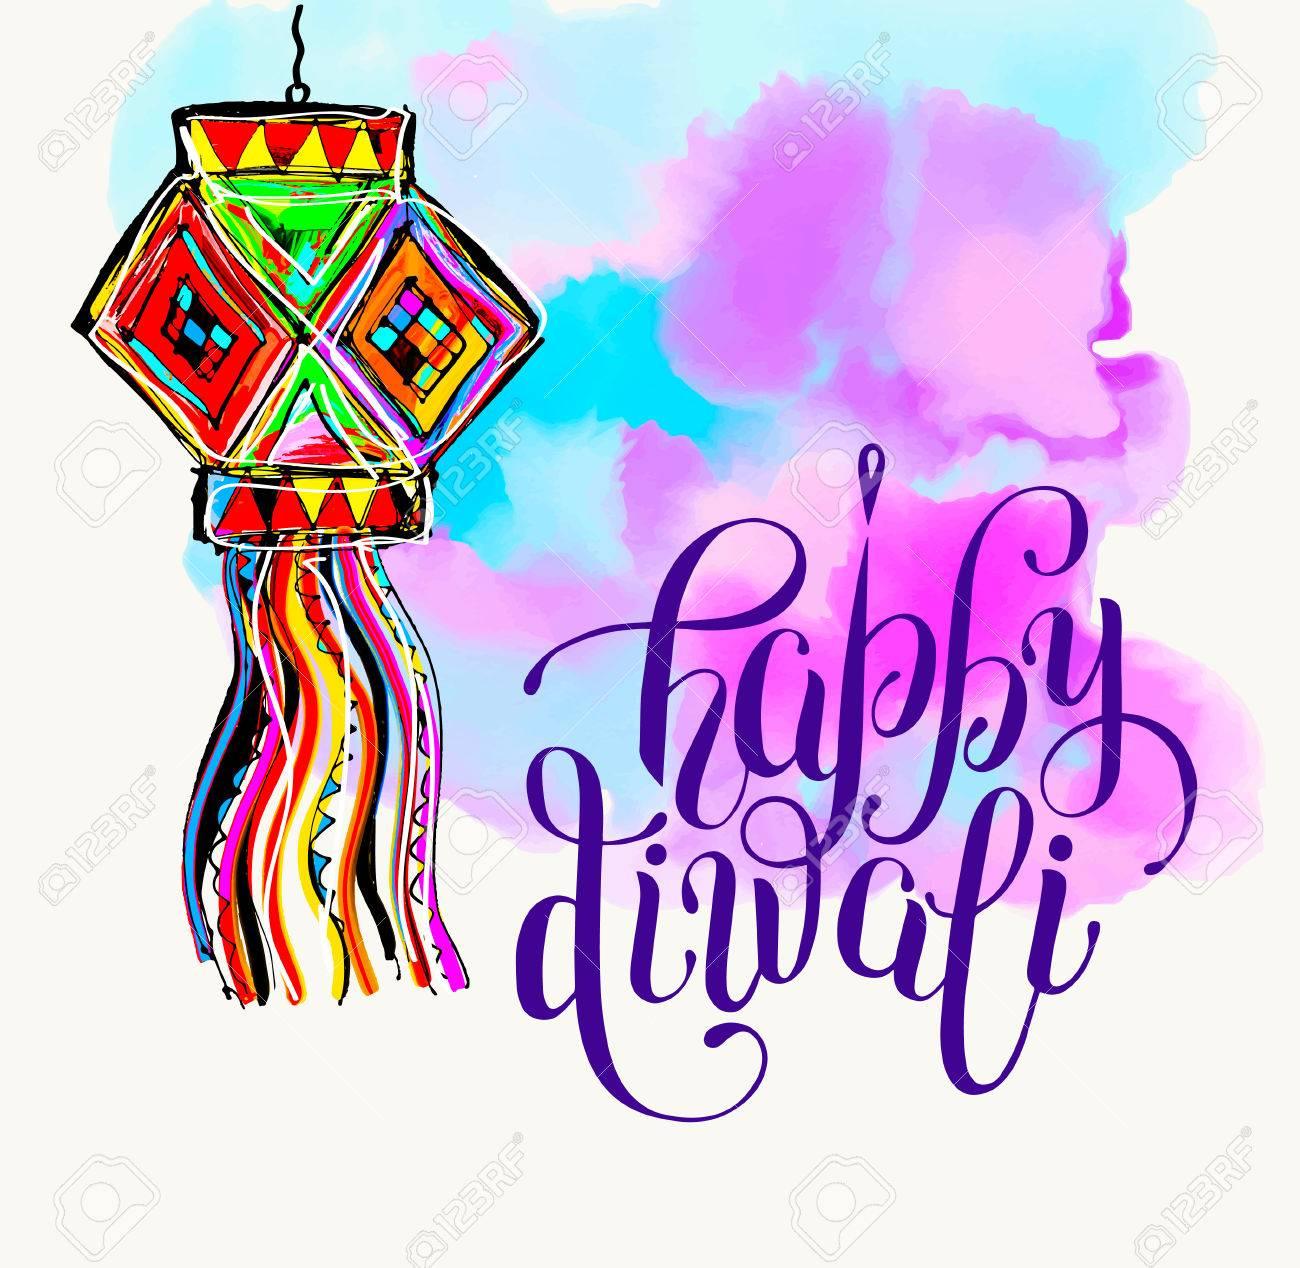 happy diwali watercolor greeting card to indian fire festival rh 123rf com